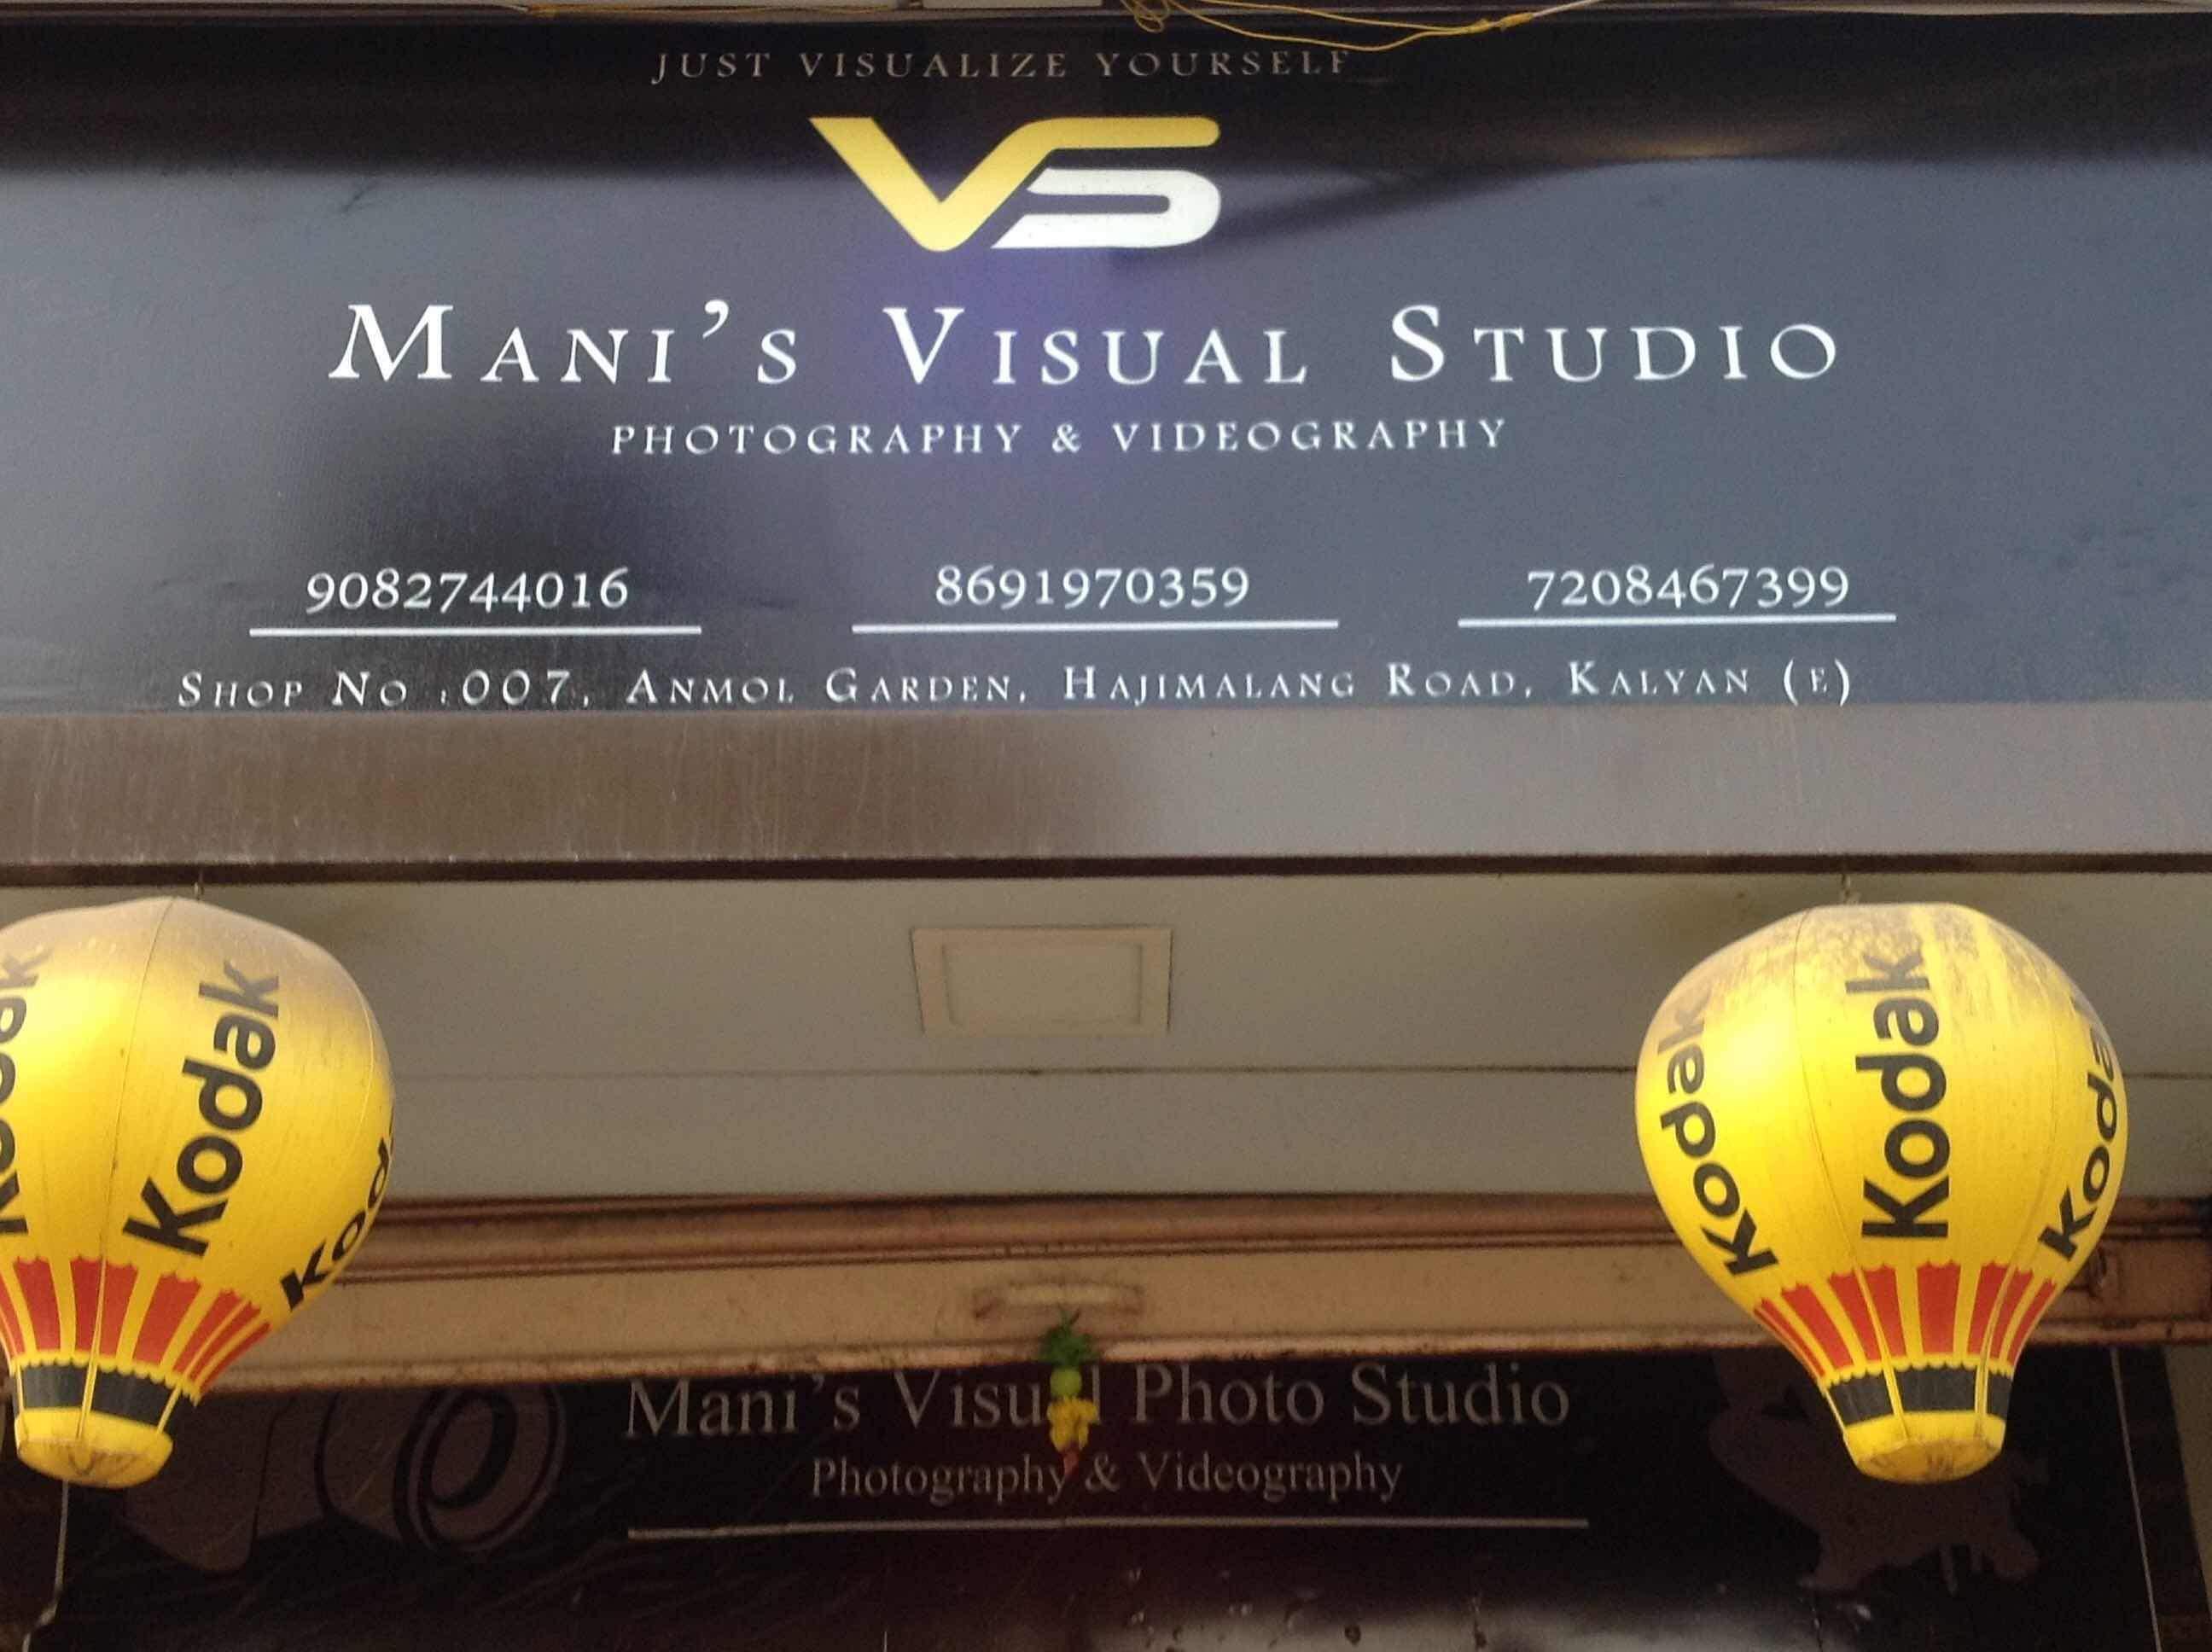 Manis Visual Studio Kalyan East Photographers In Thane Mumbai Justdial